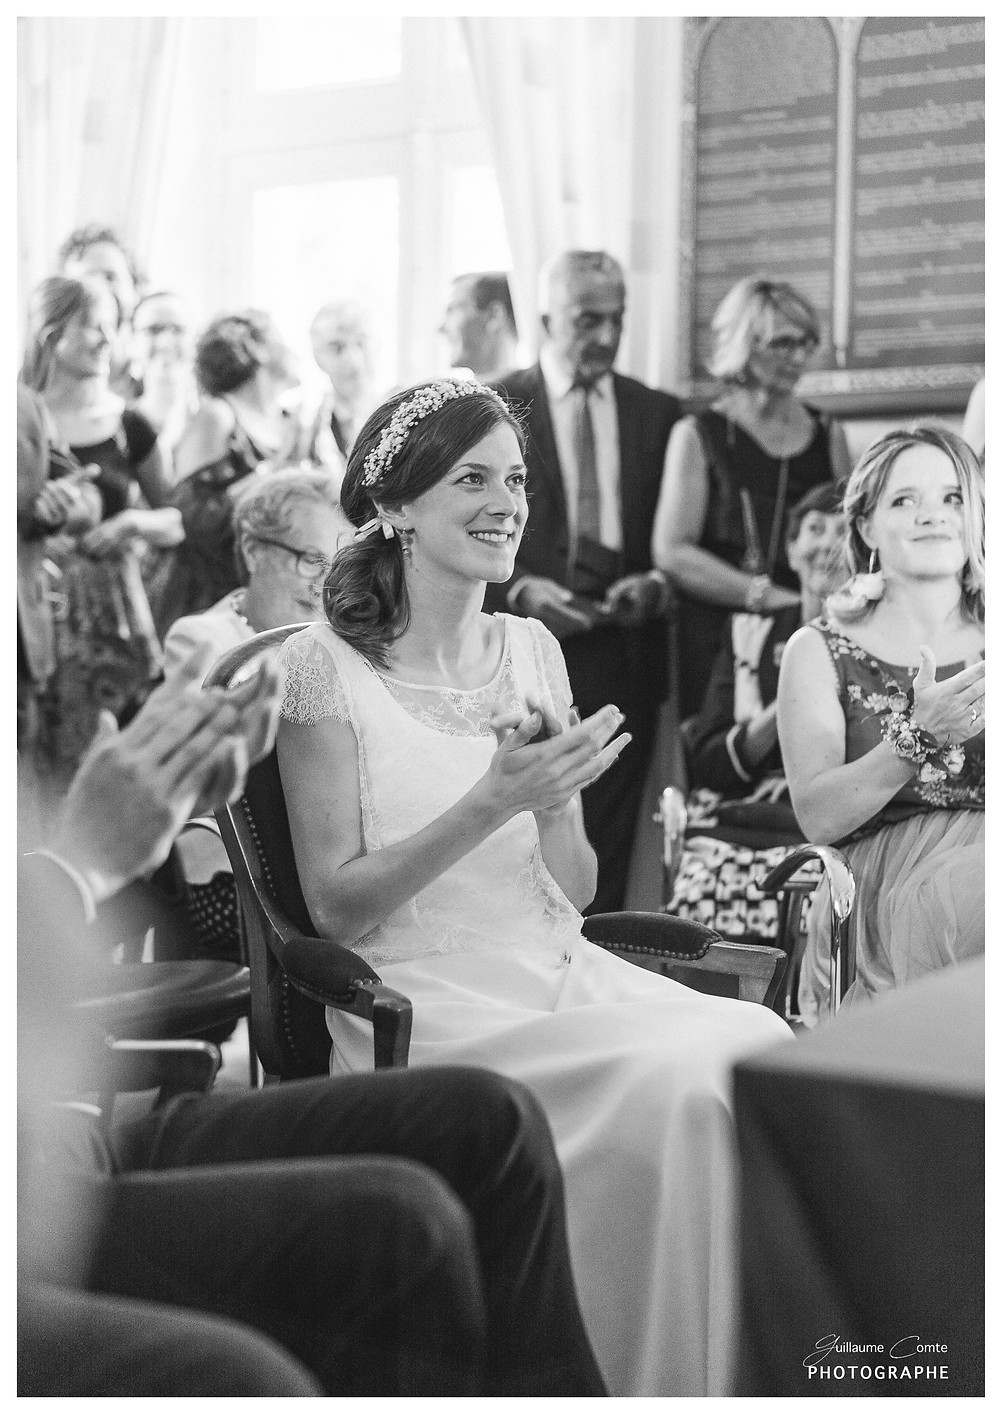 Photographe Mariage Wedding Limoges Limousin Guillaume Comte Saint Leonard